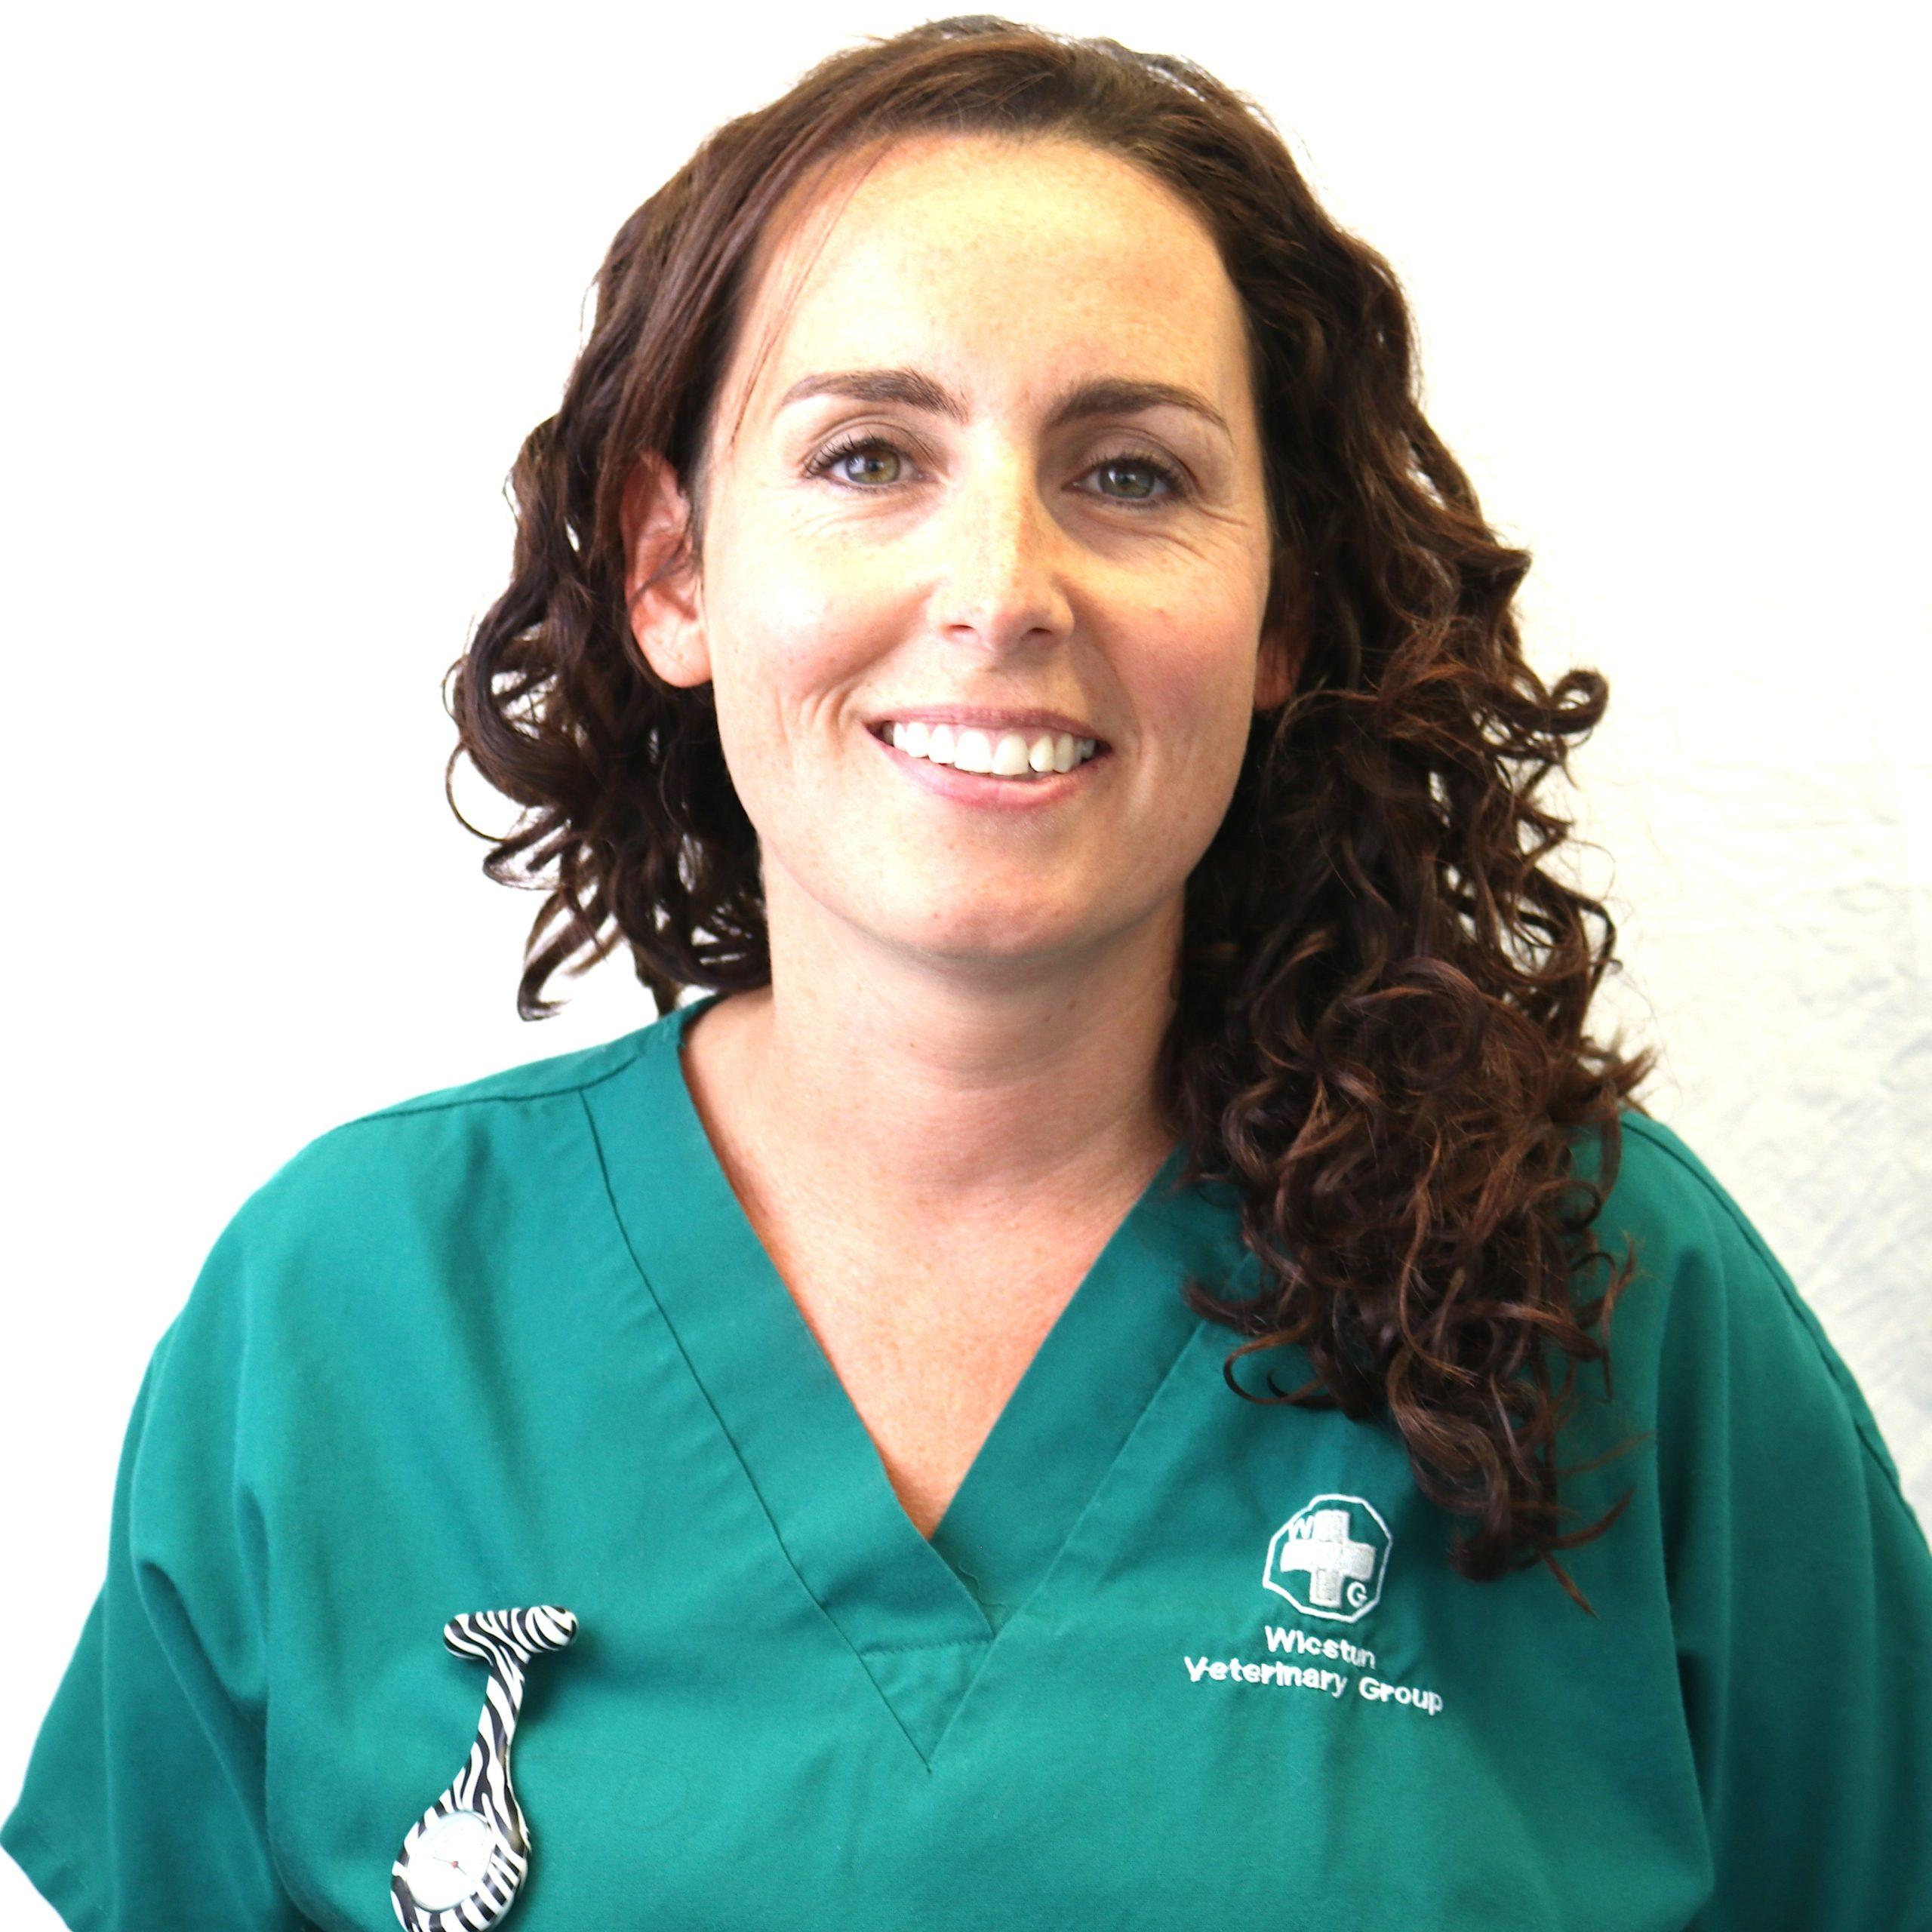 Emma Parkin - Wicstun Vet Group Vet Nurse